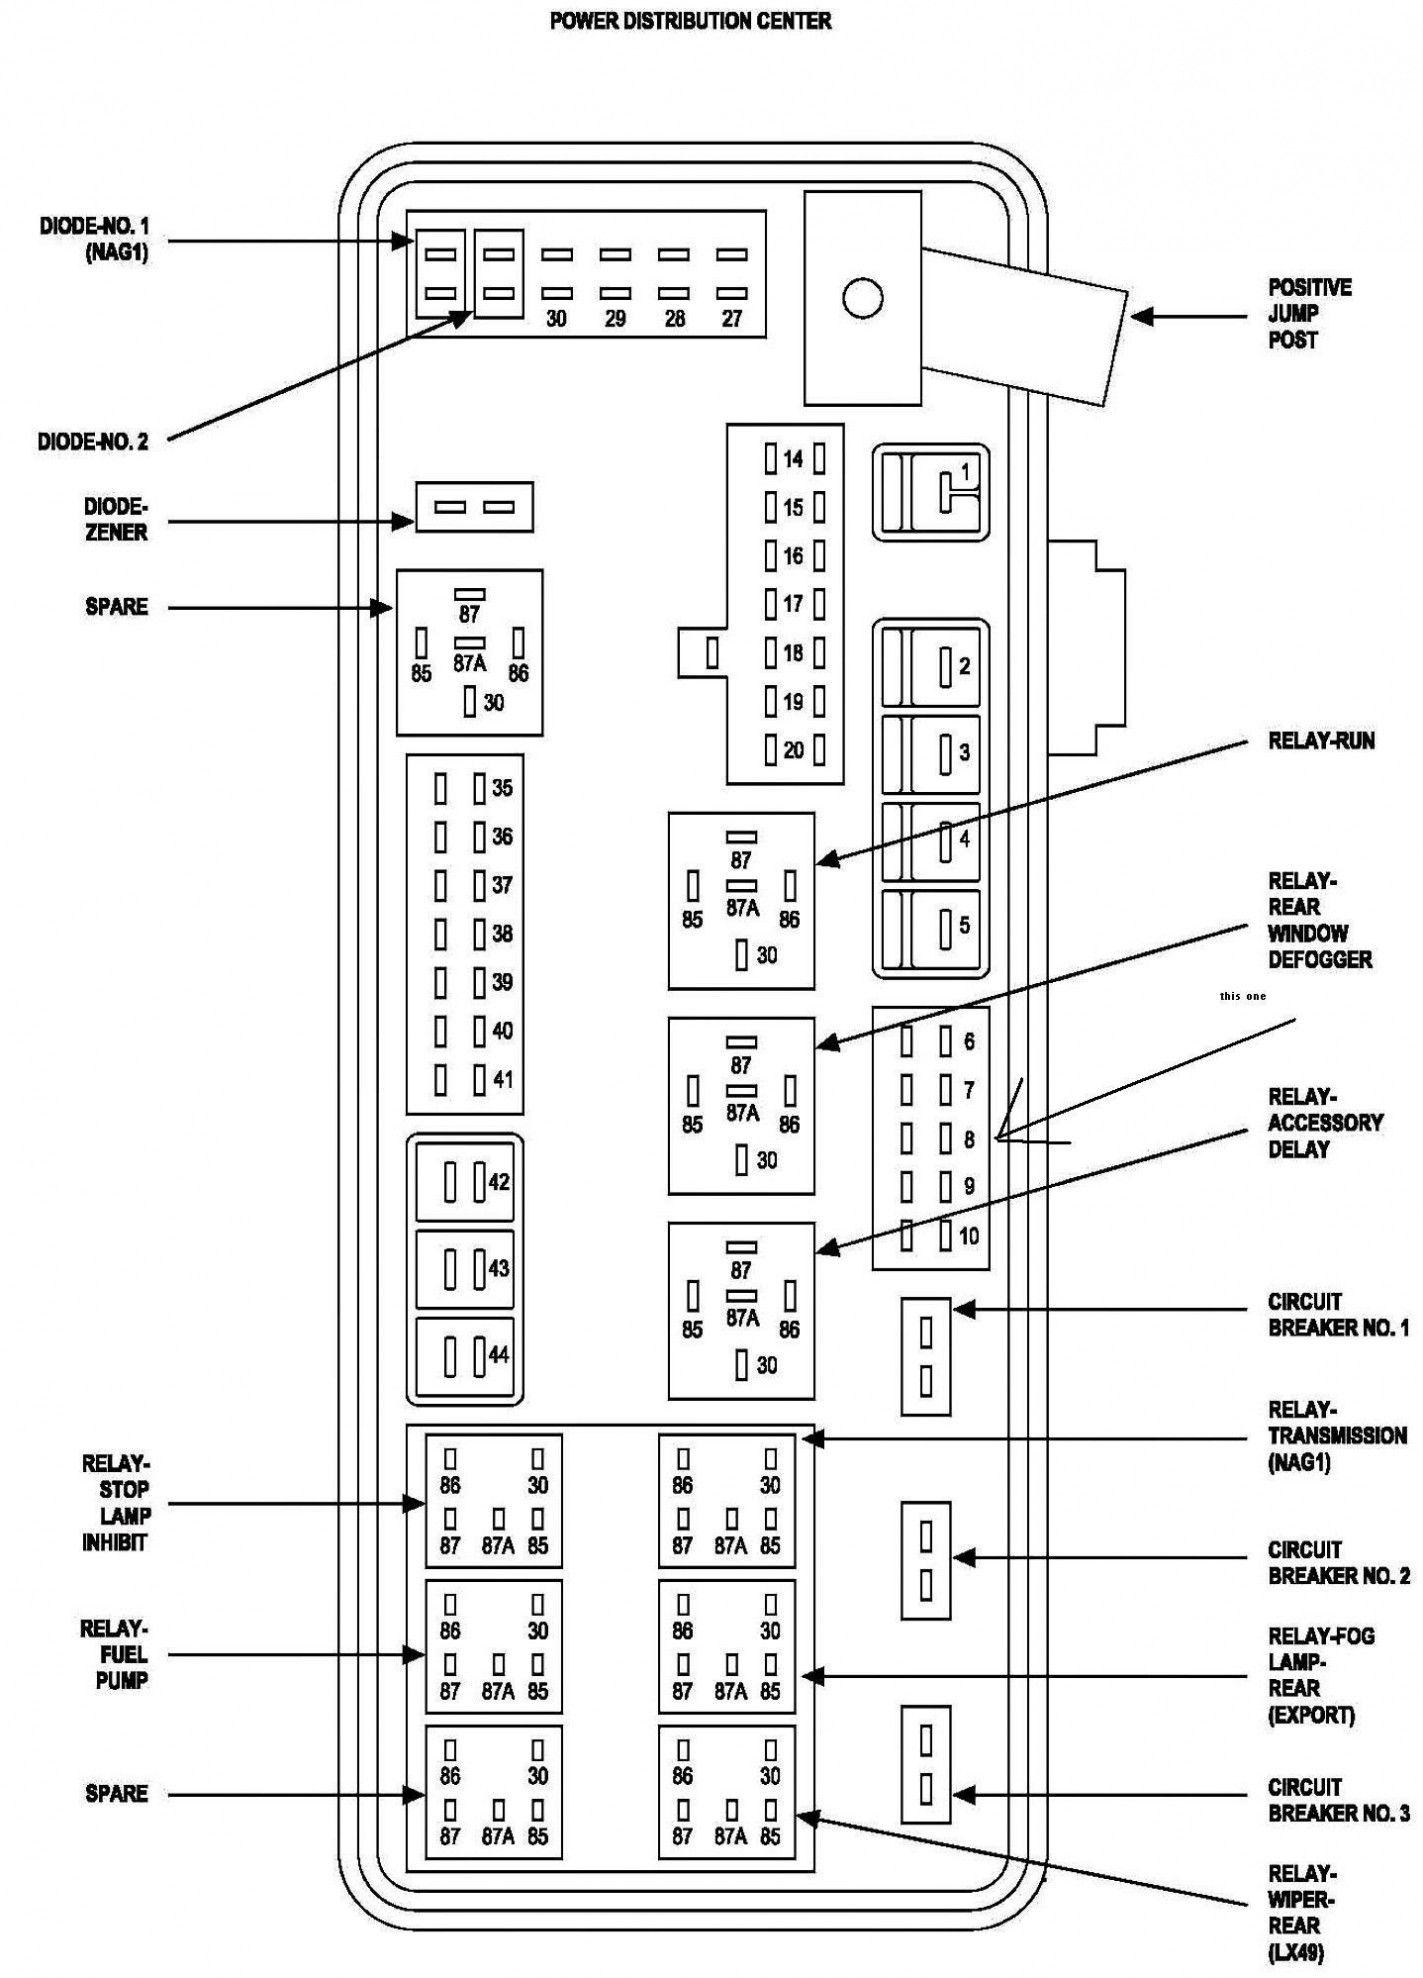 hight resolution of new 2004 dodge ram 1500 infinity wiring diagram diagram diagramsample diagramtemplate wiringdiagram